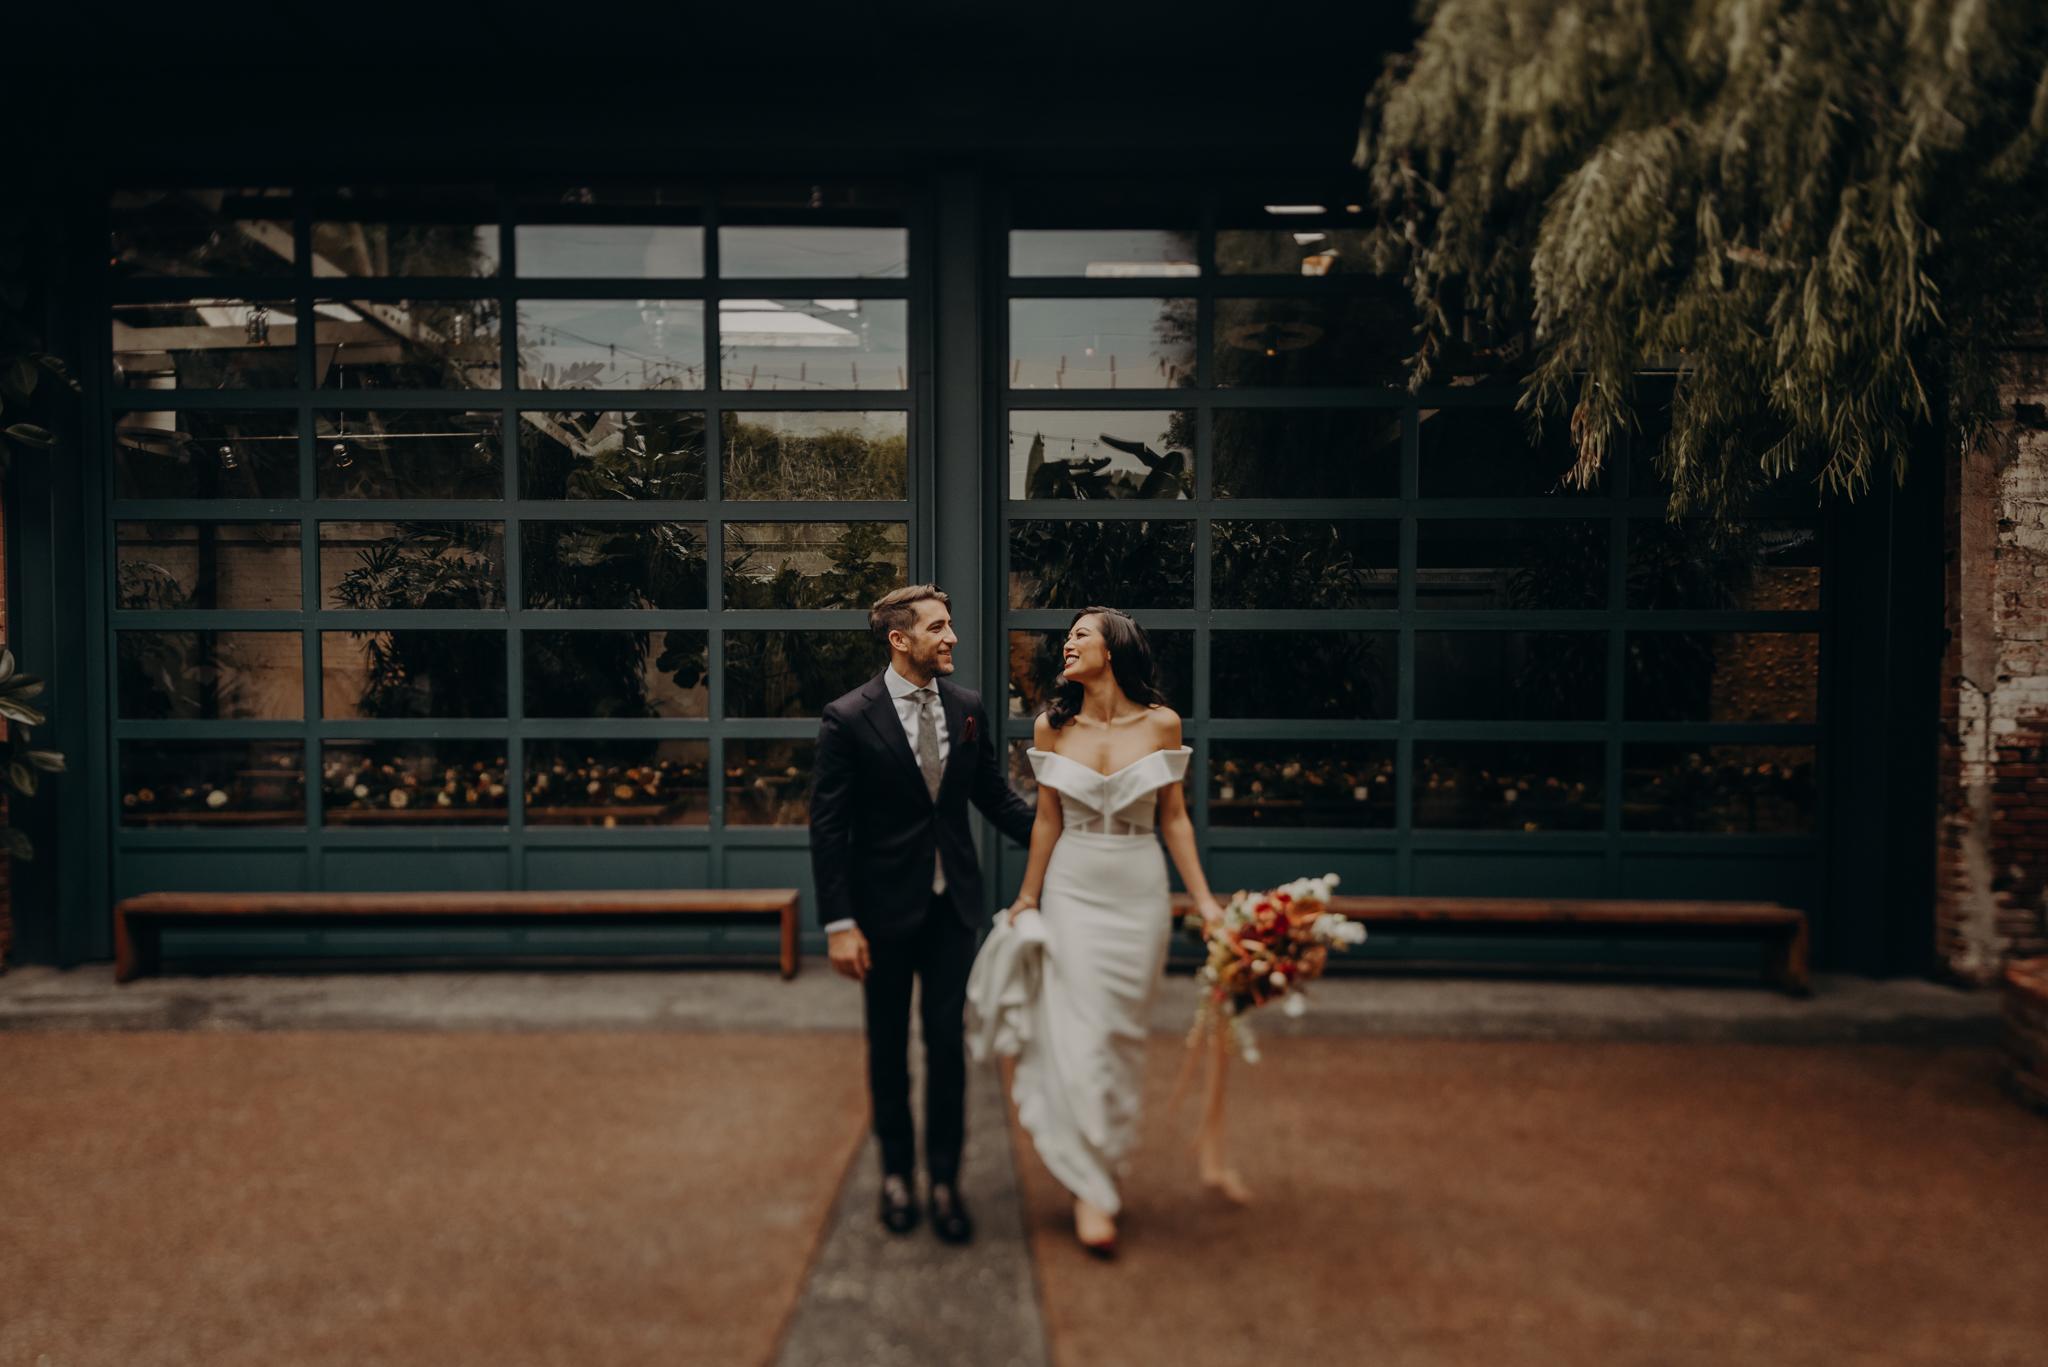 Wedding Photo LA - wedding photographer in los angeles - millwick wedding venue -isaiahandtaylor.com-046.jpg